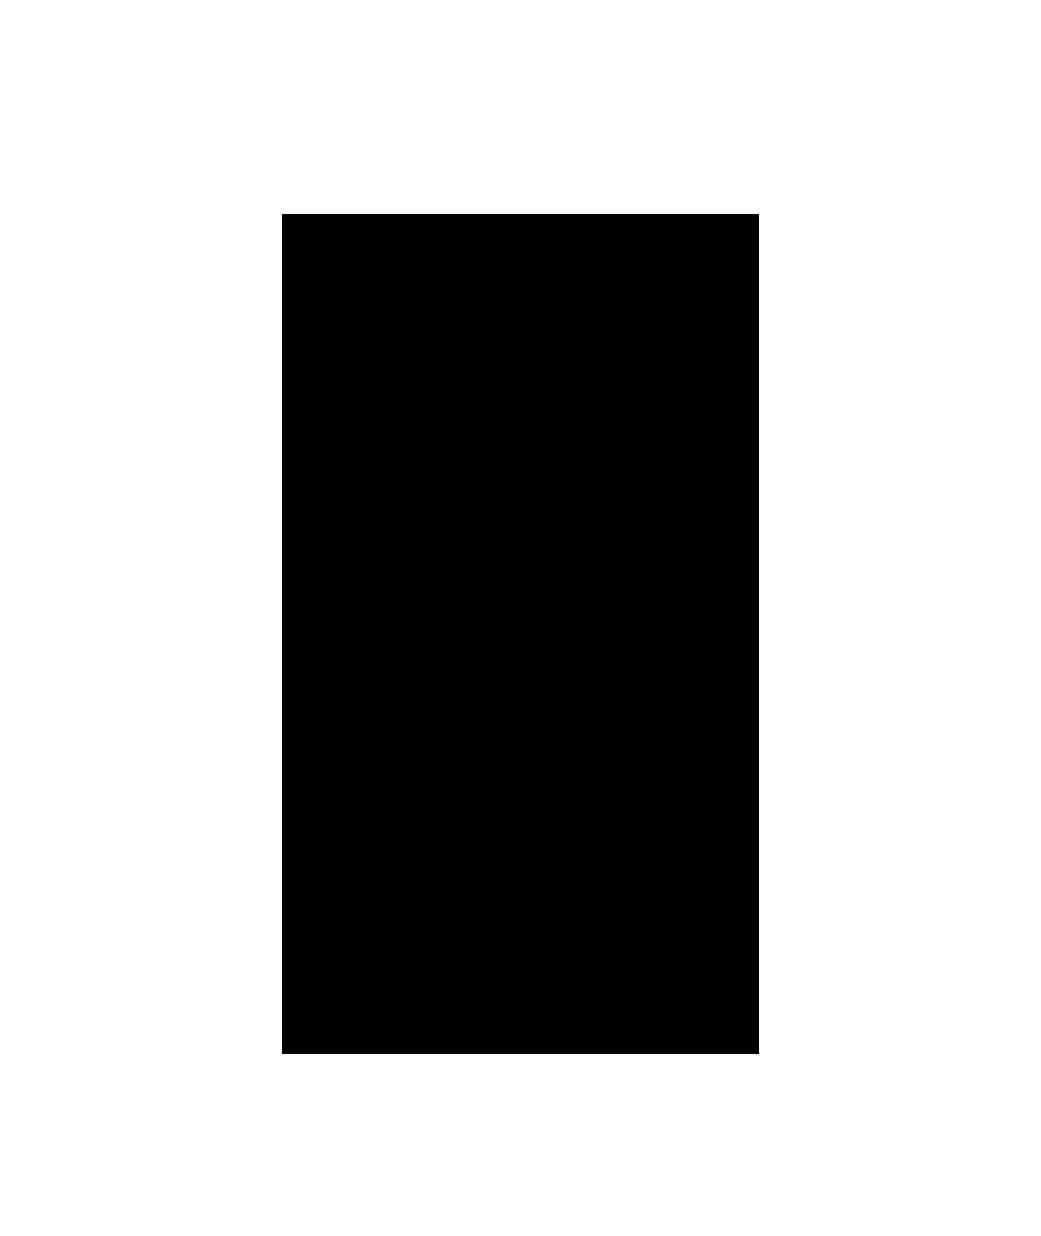 Elviano logo